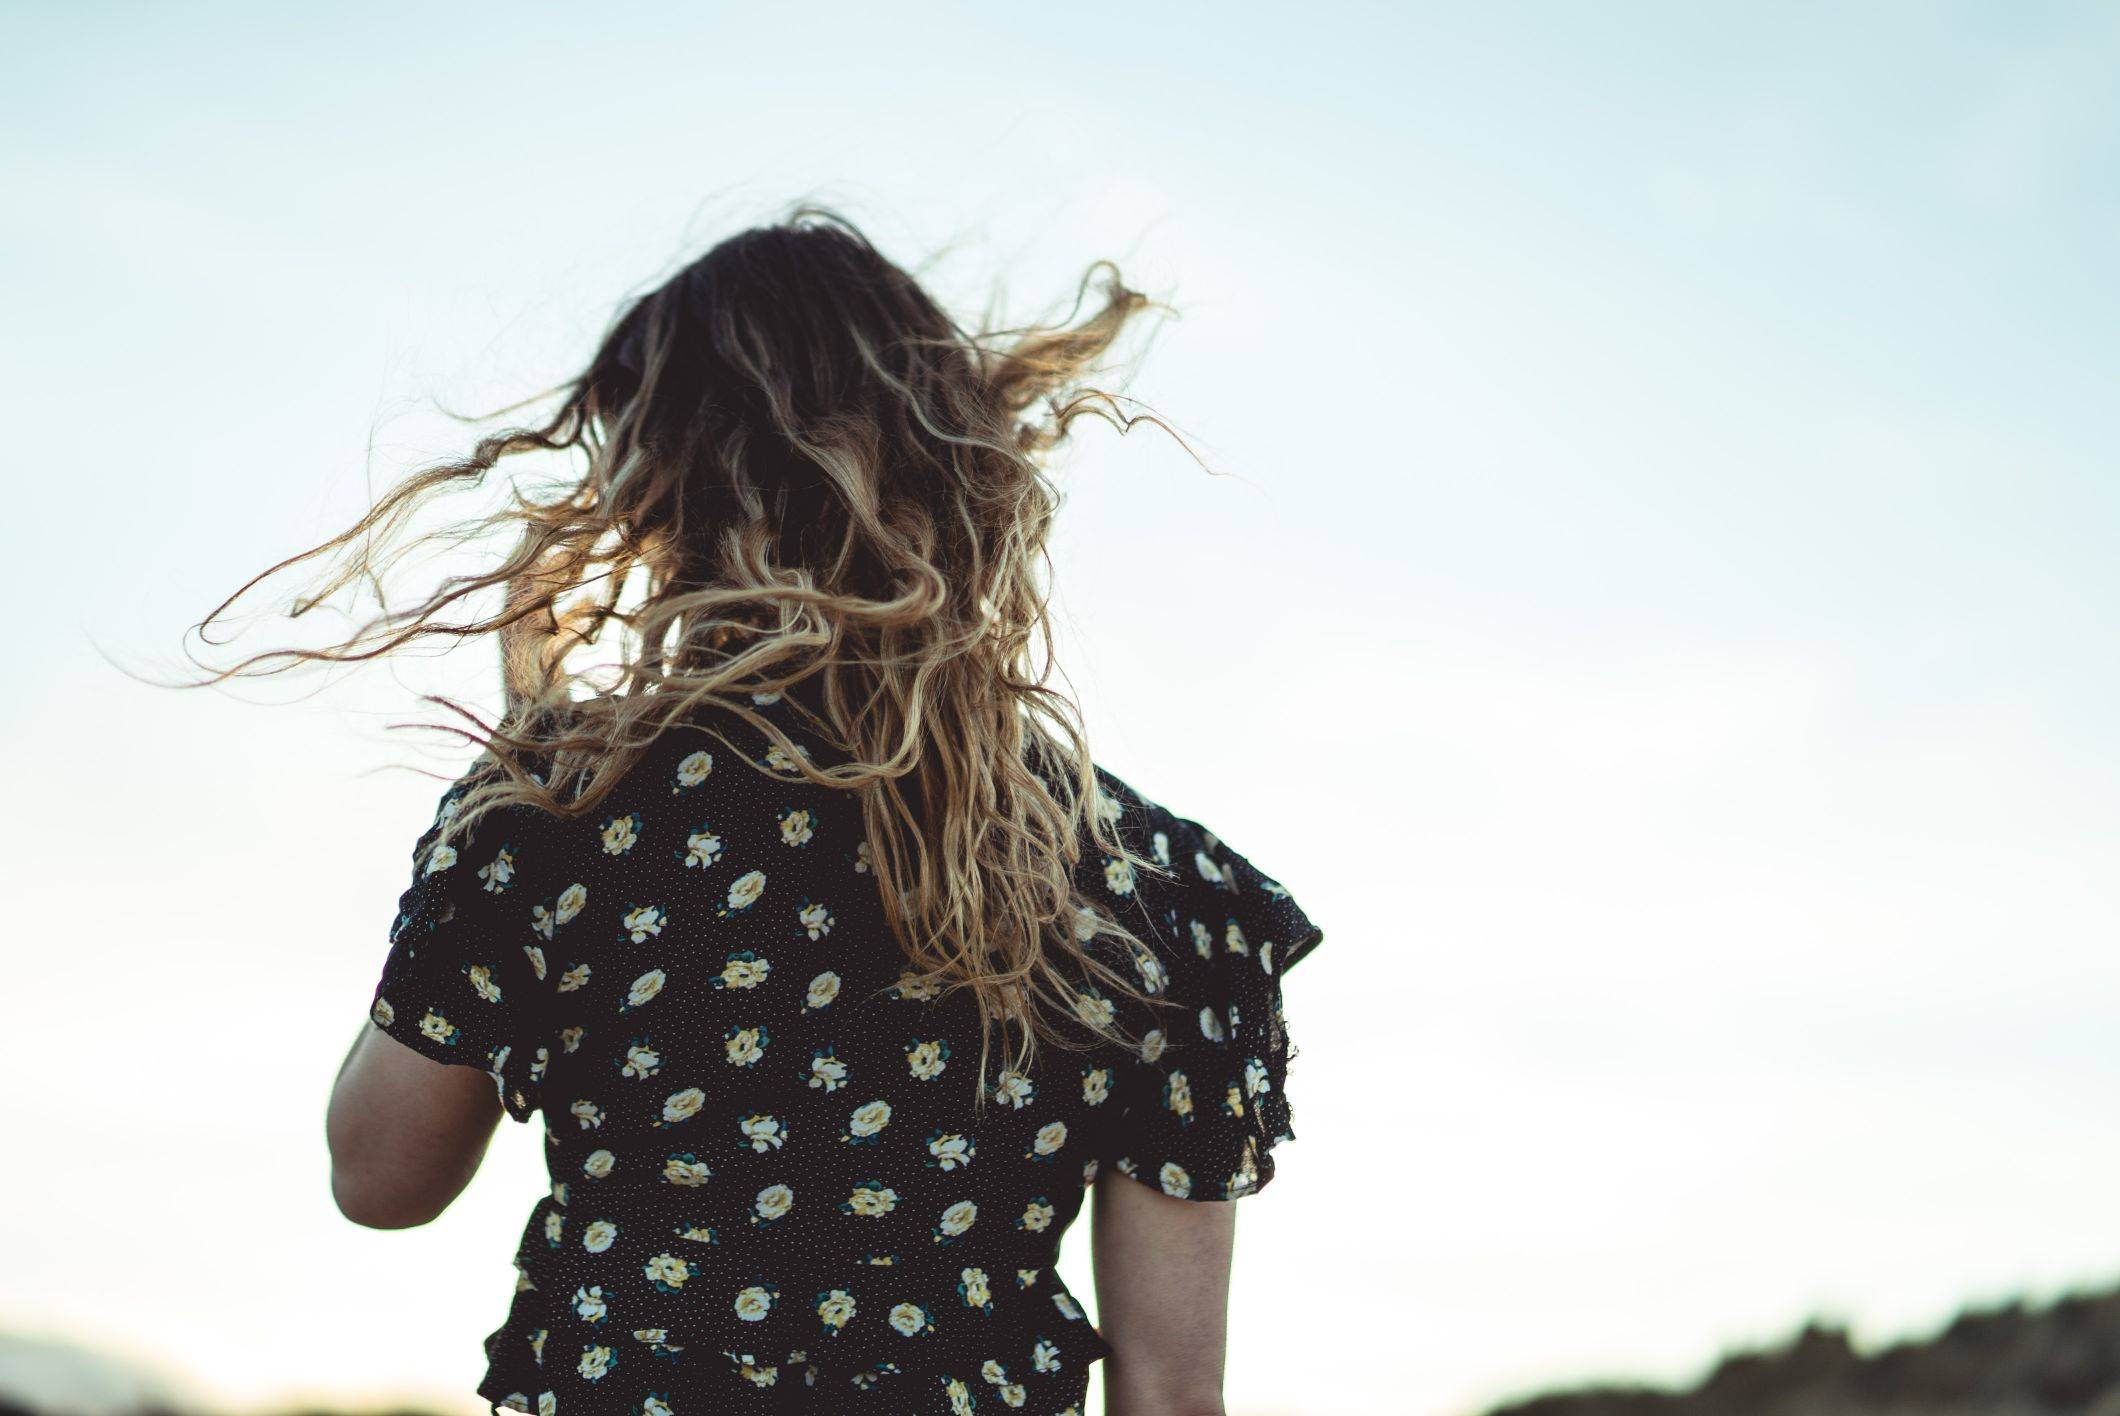 Image of wavy hair blowing in wind